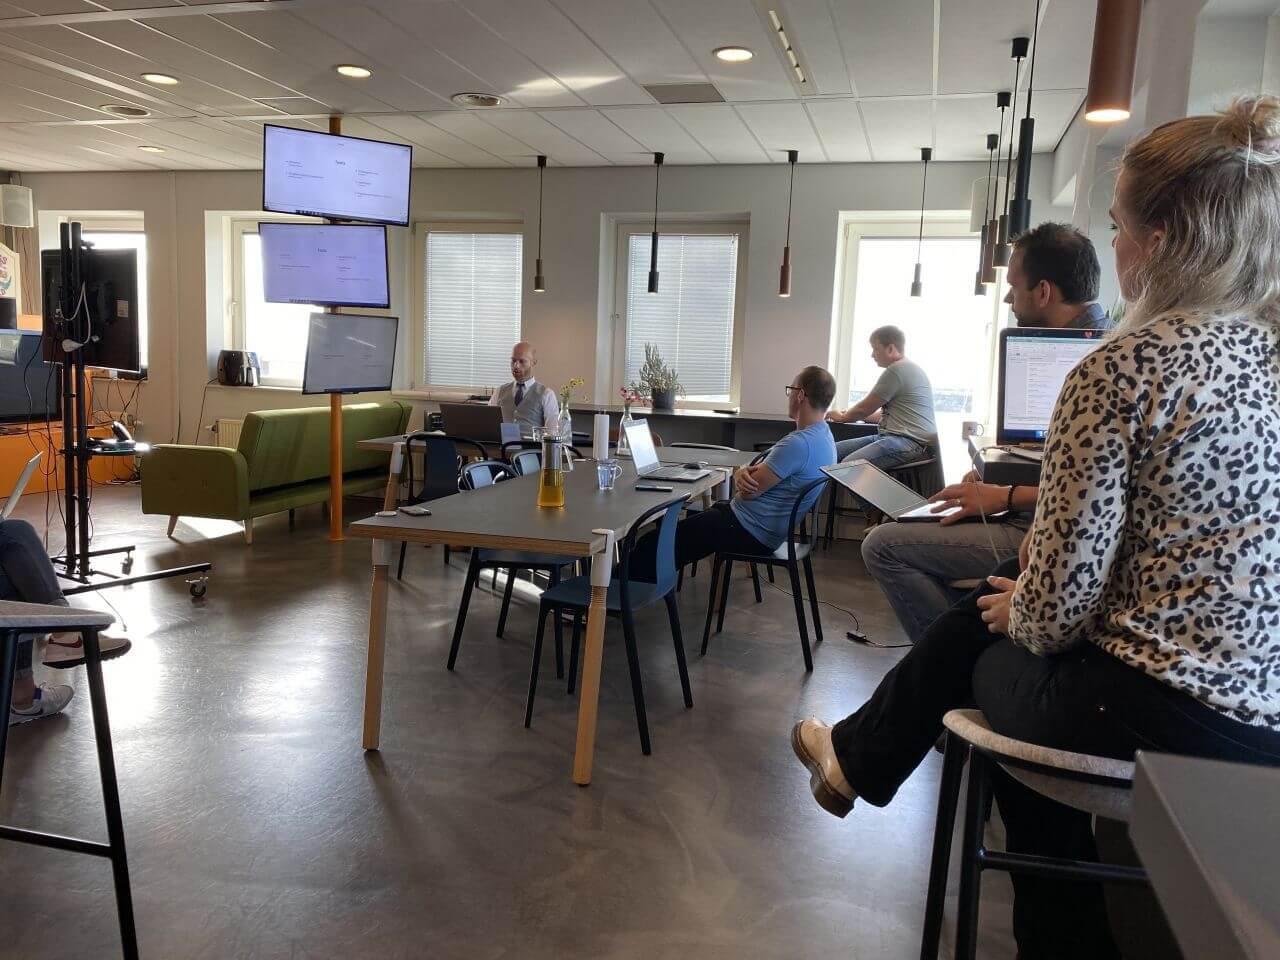 Visiting three marketing and development agencies